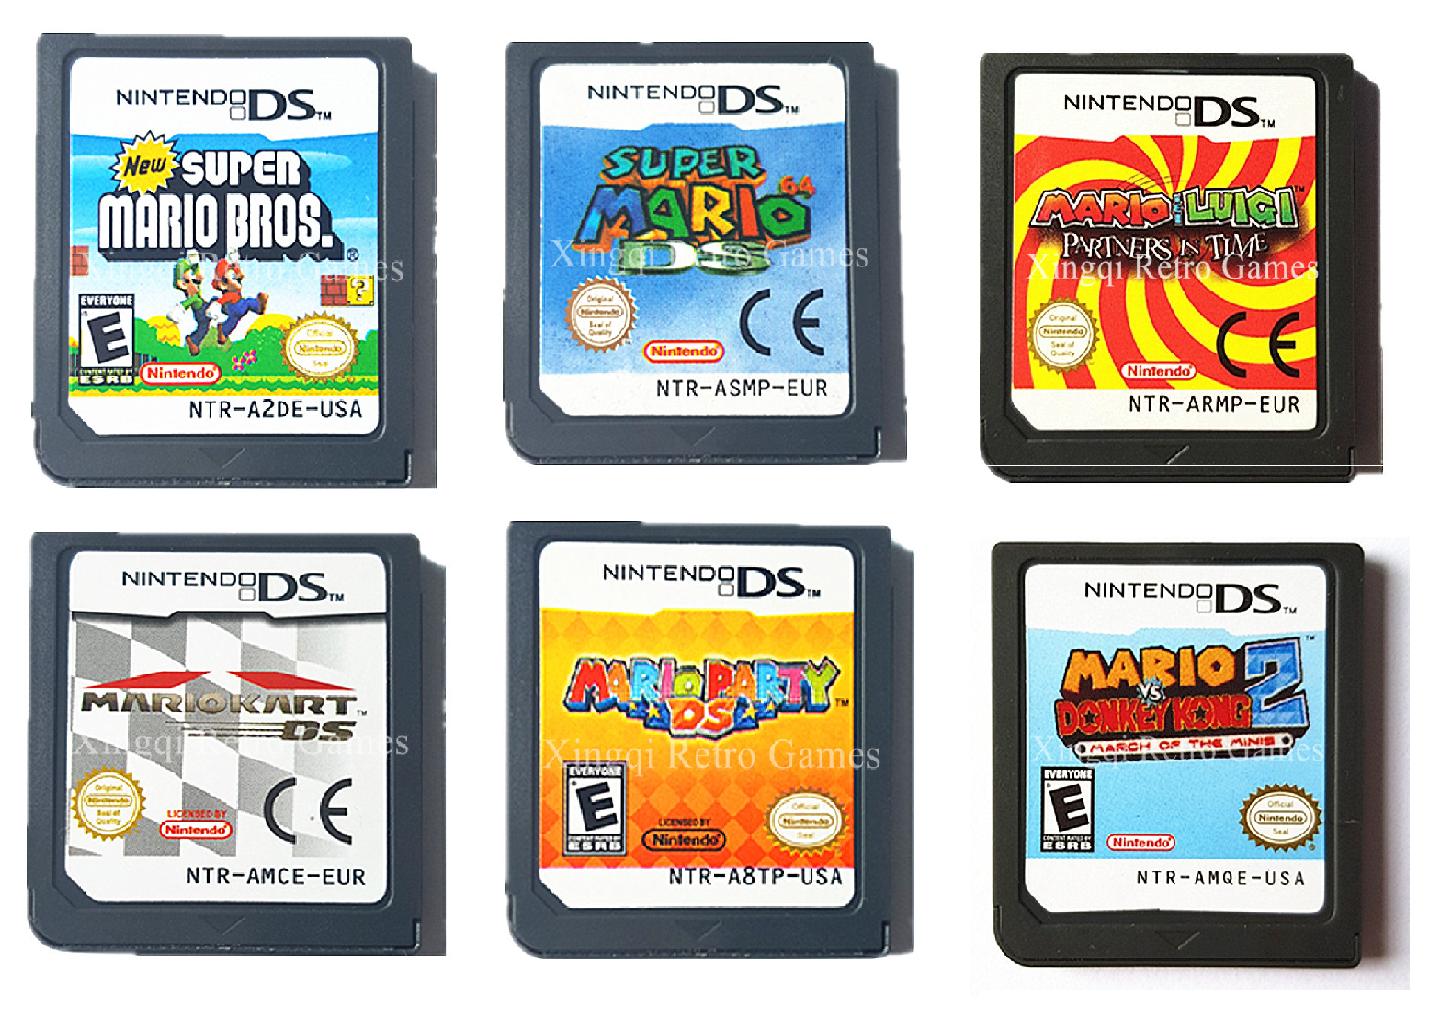 Mario Nds Reproduction Carts New Super Mario Bros Super Mario 64 Ds Mario And Luigi Partners In Time Mario Kart Ds Mario Party Ds Mario Vs Donkey Kong